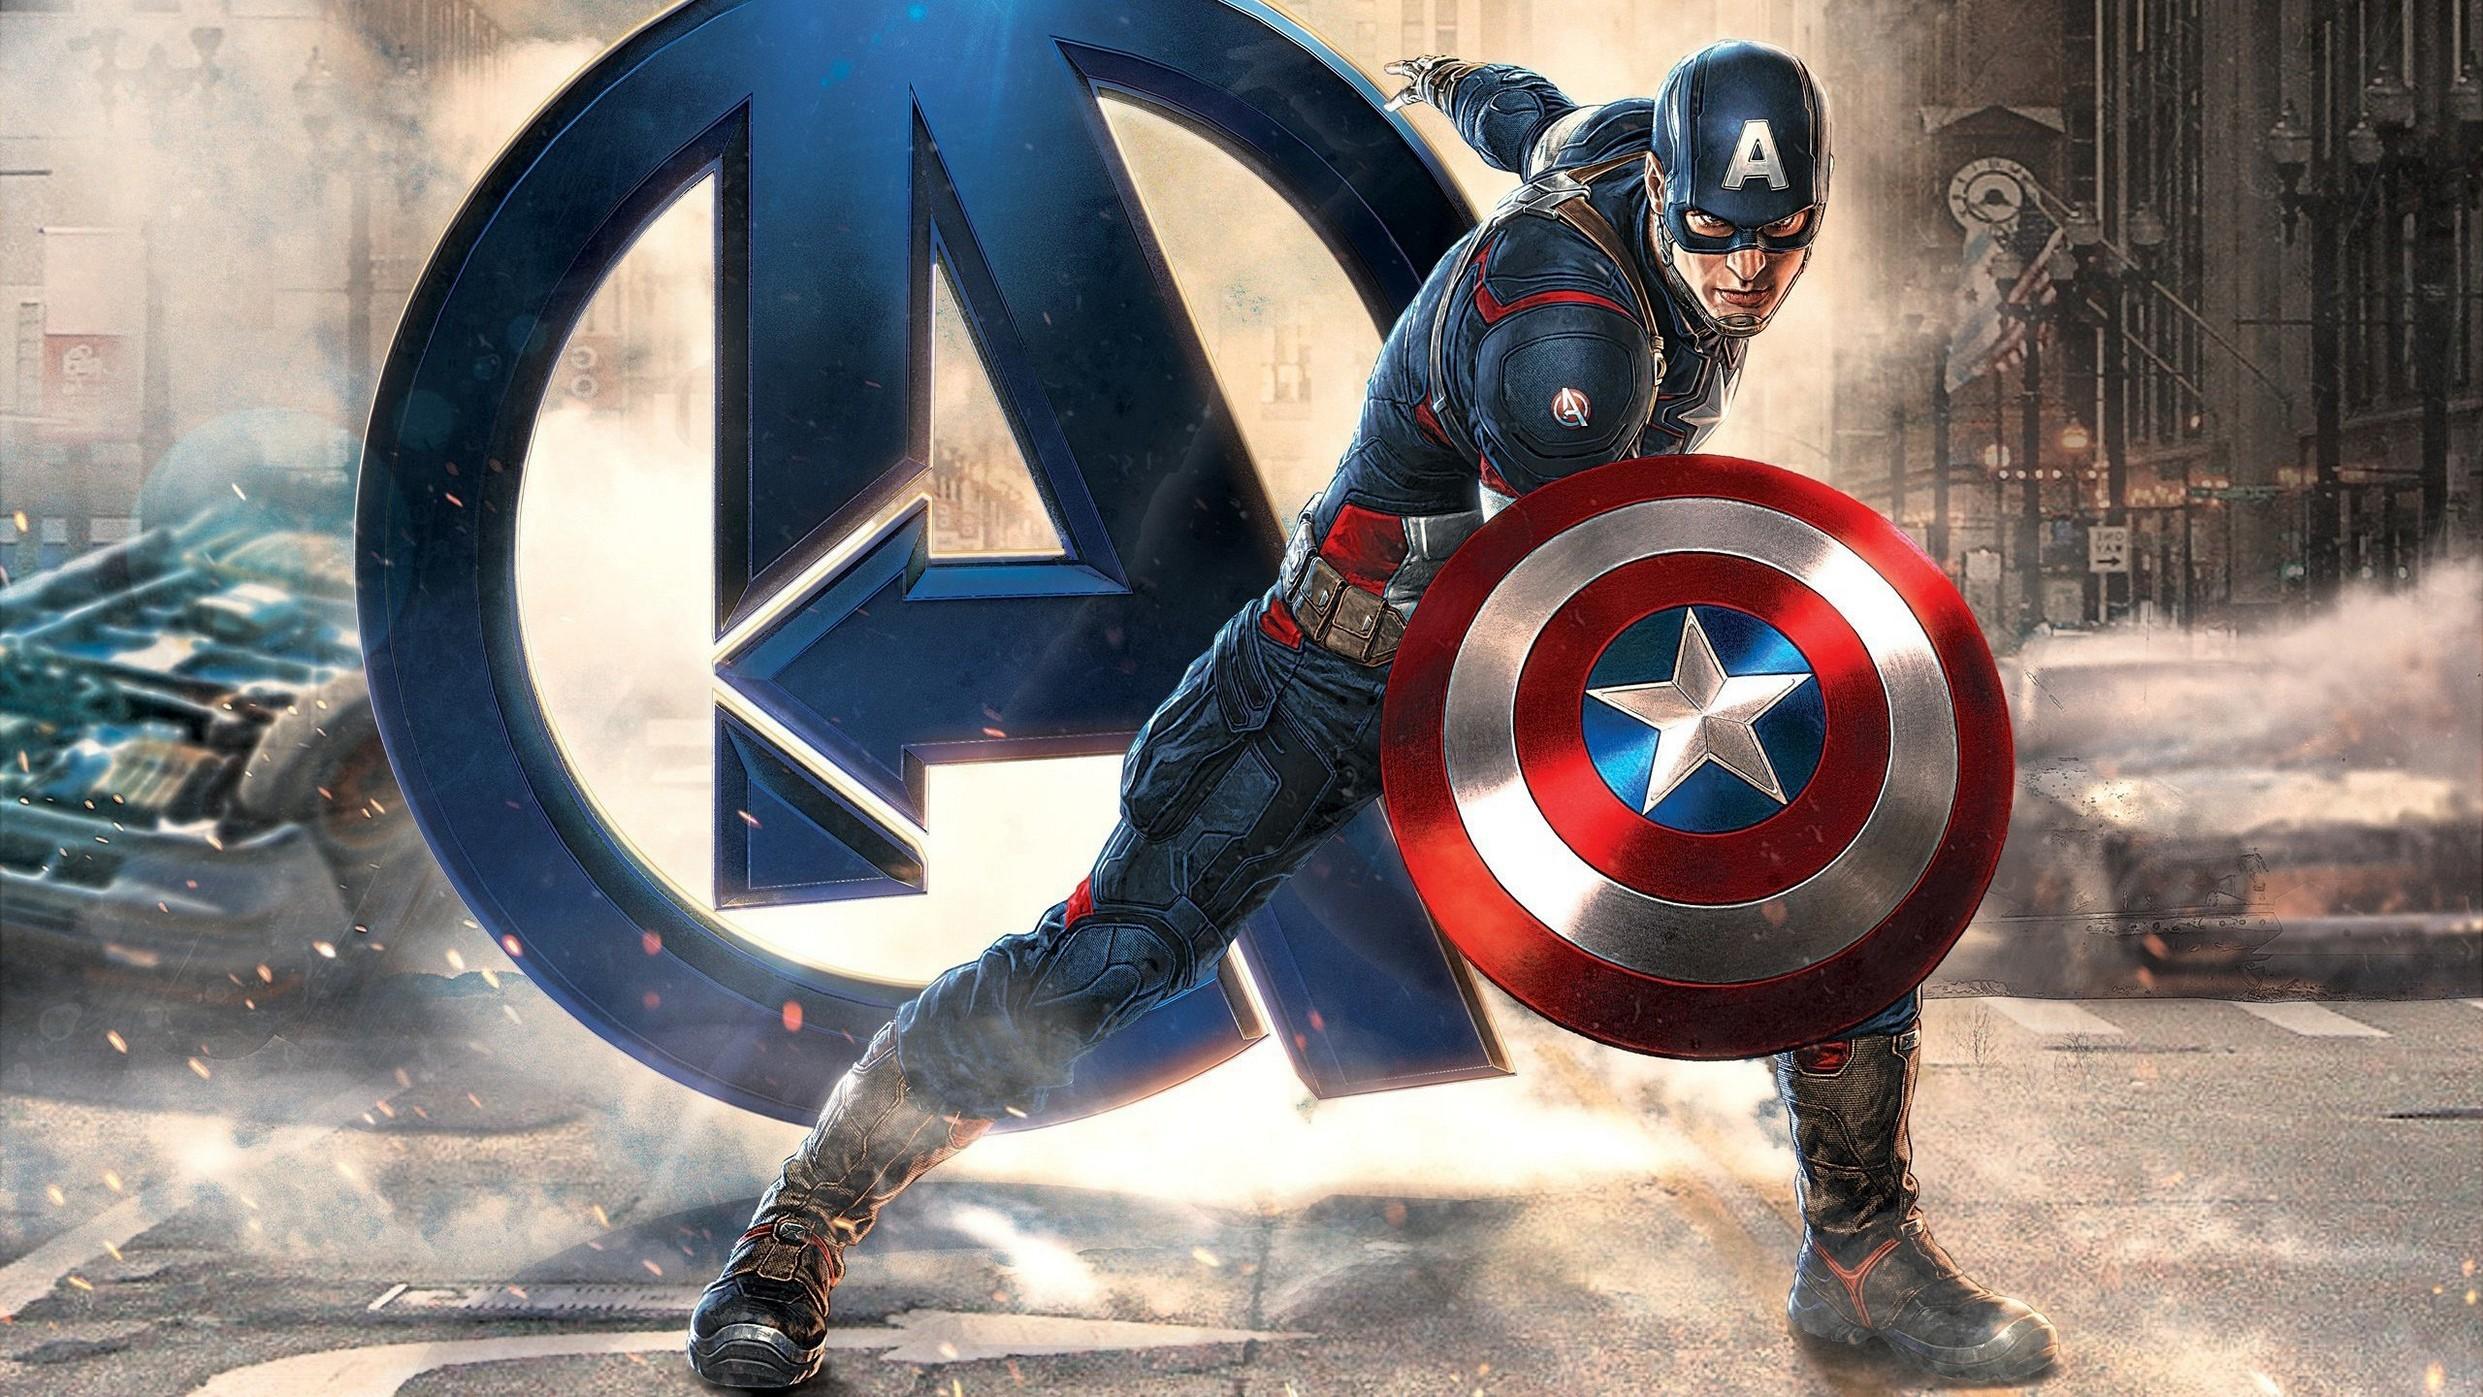 Captain America Avengers Good Anime Dual Monitor Wallpaper